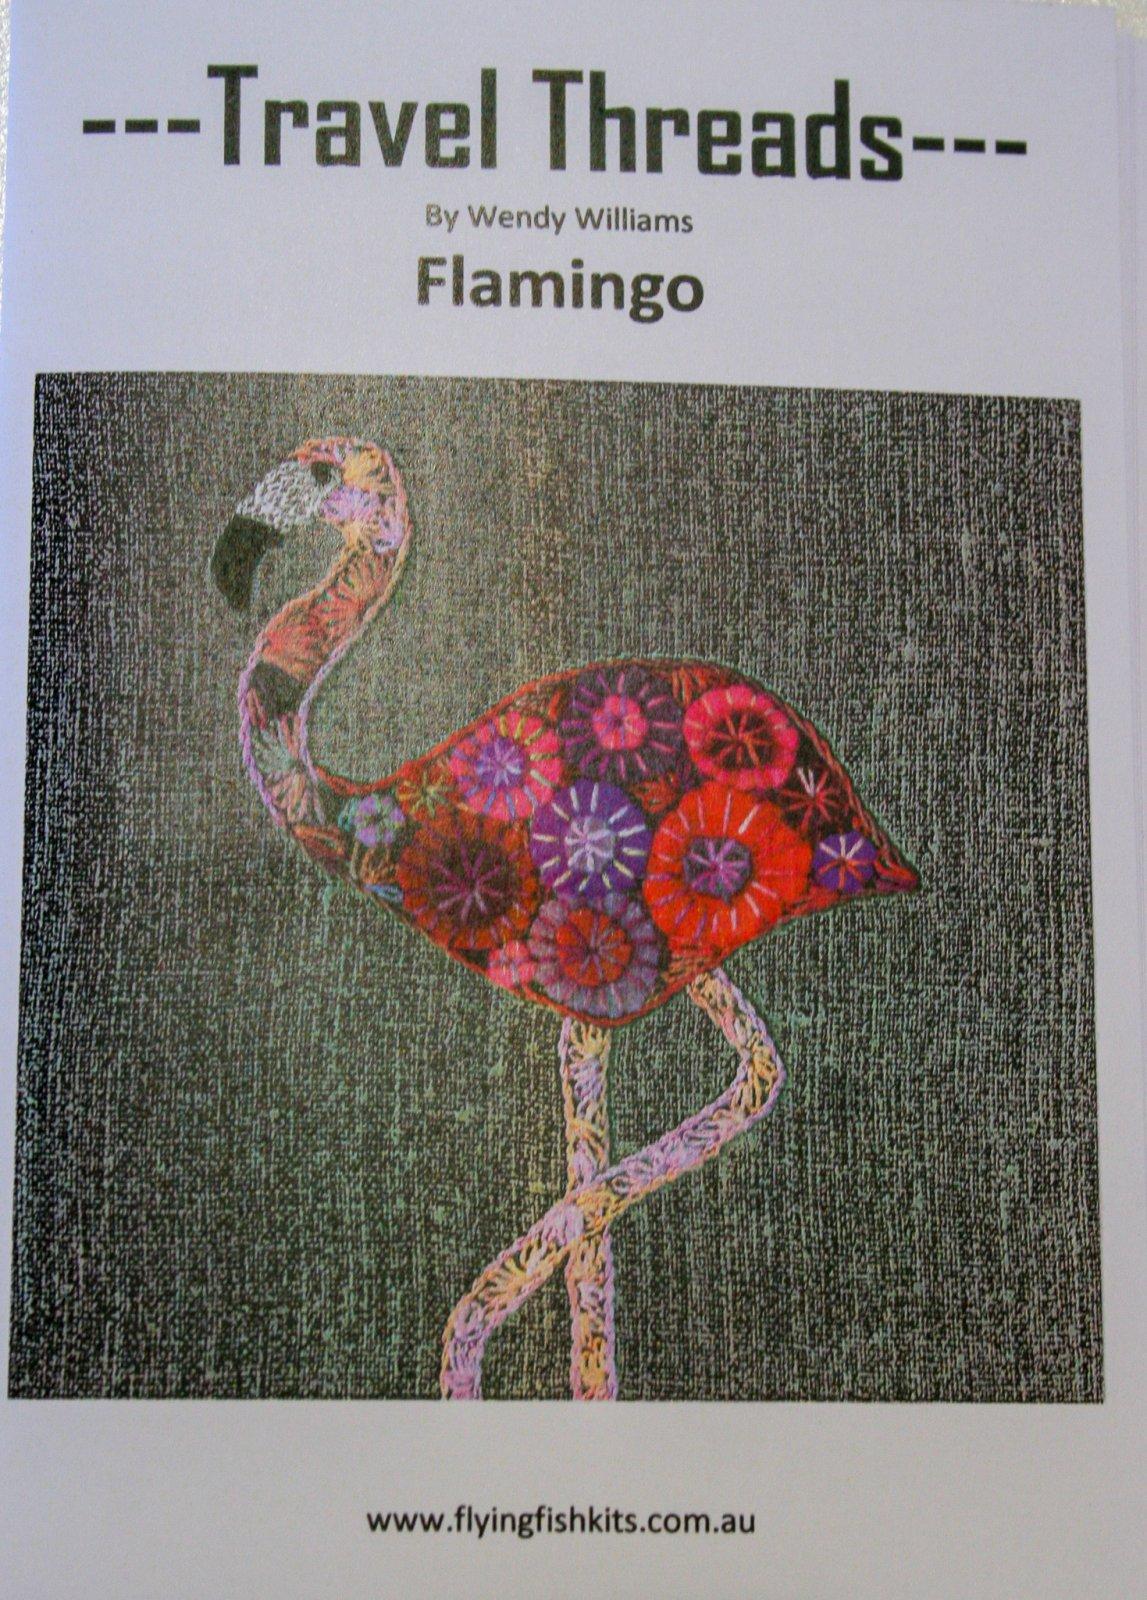 Wendy Williams : Travel Threads - Flamingo